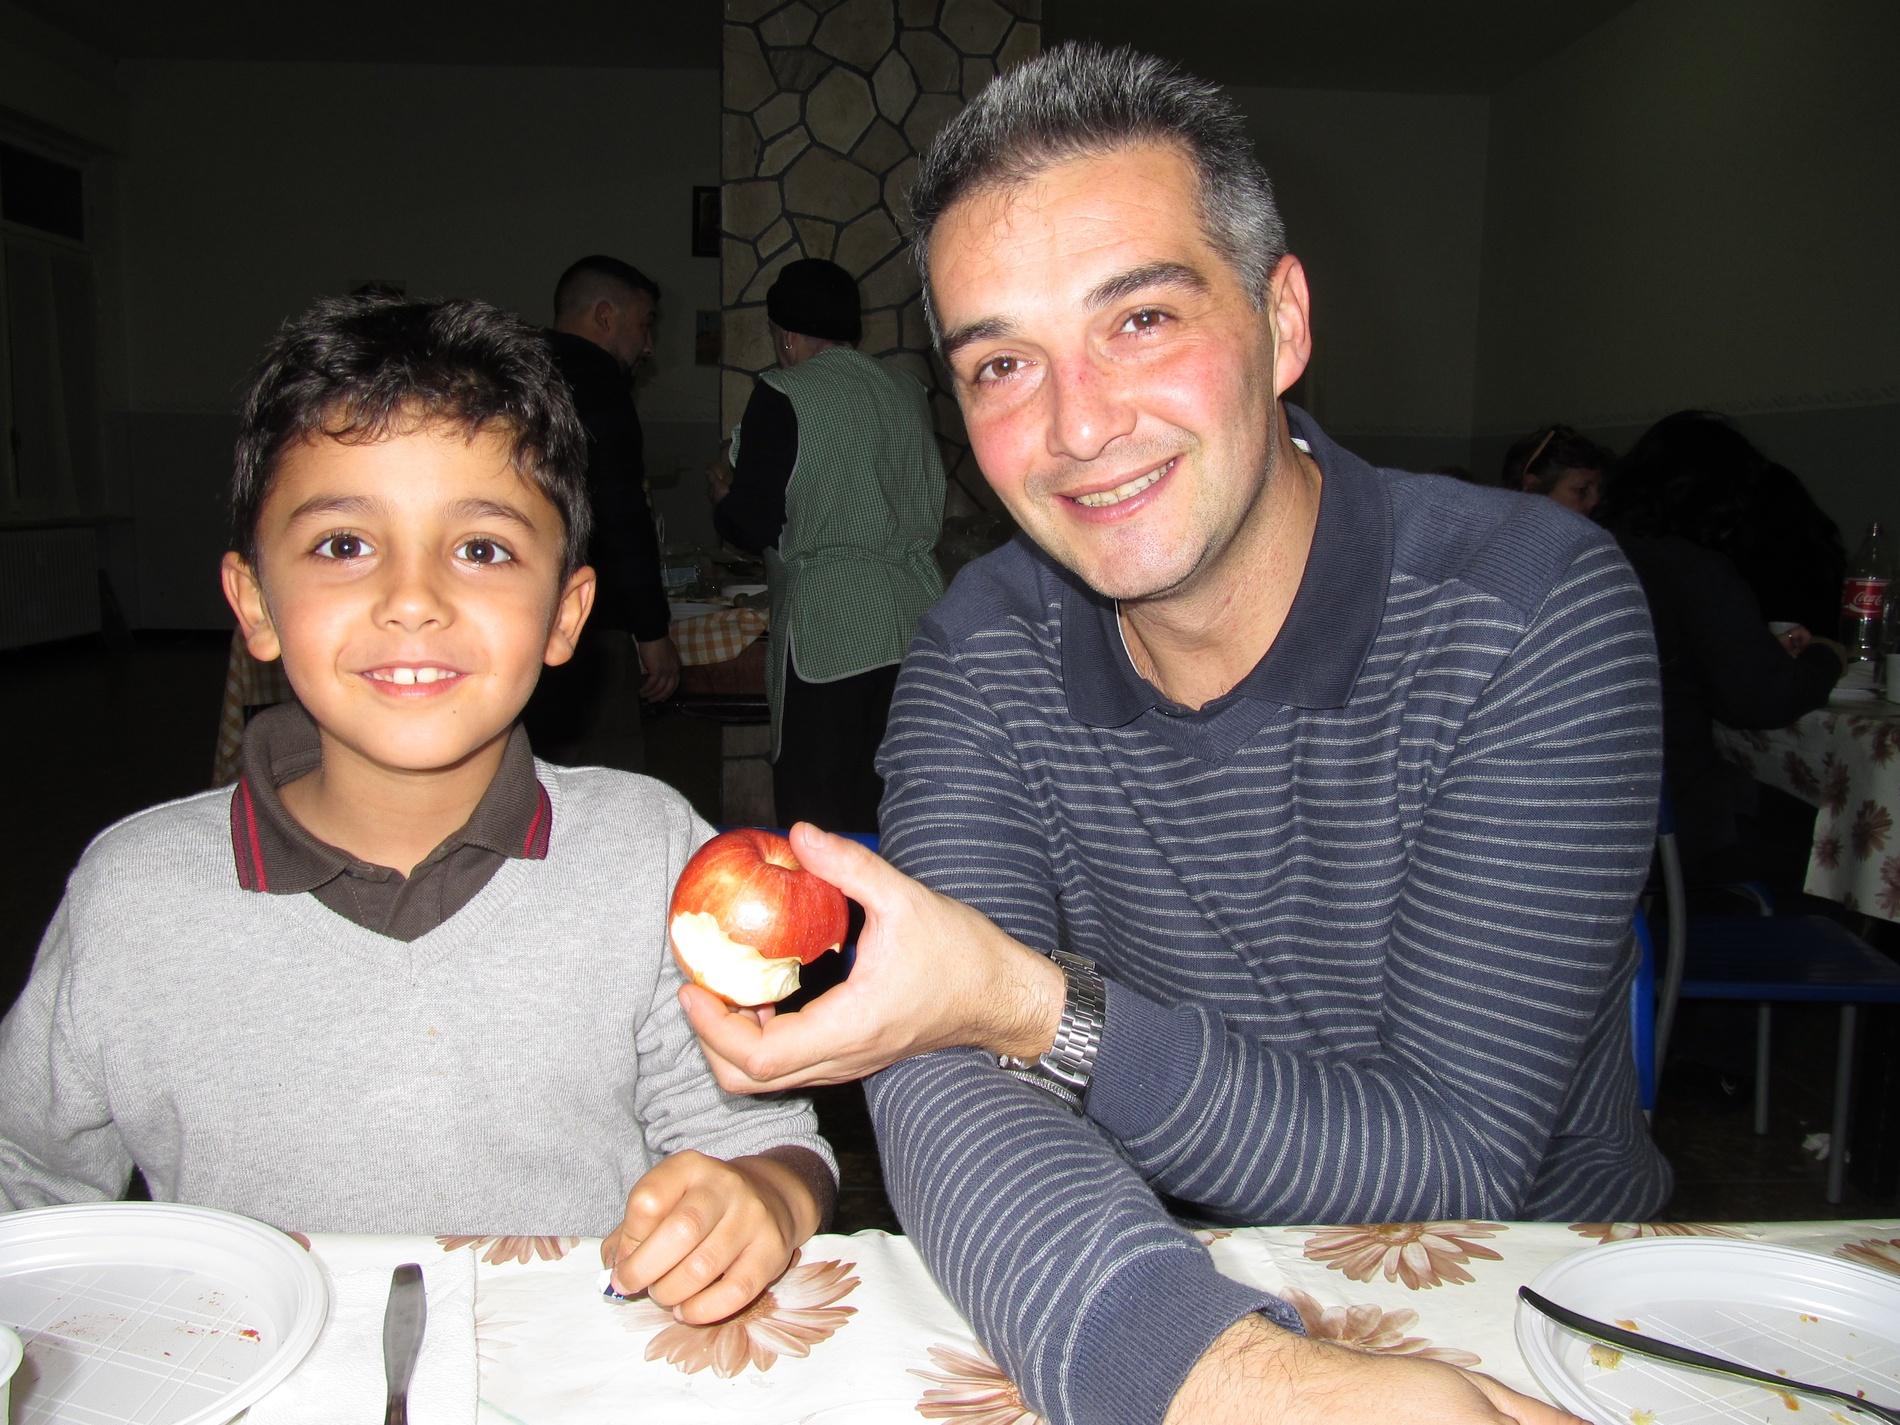 cena-famiglie-catechismo-2015-12-05-20-53-25